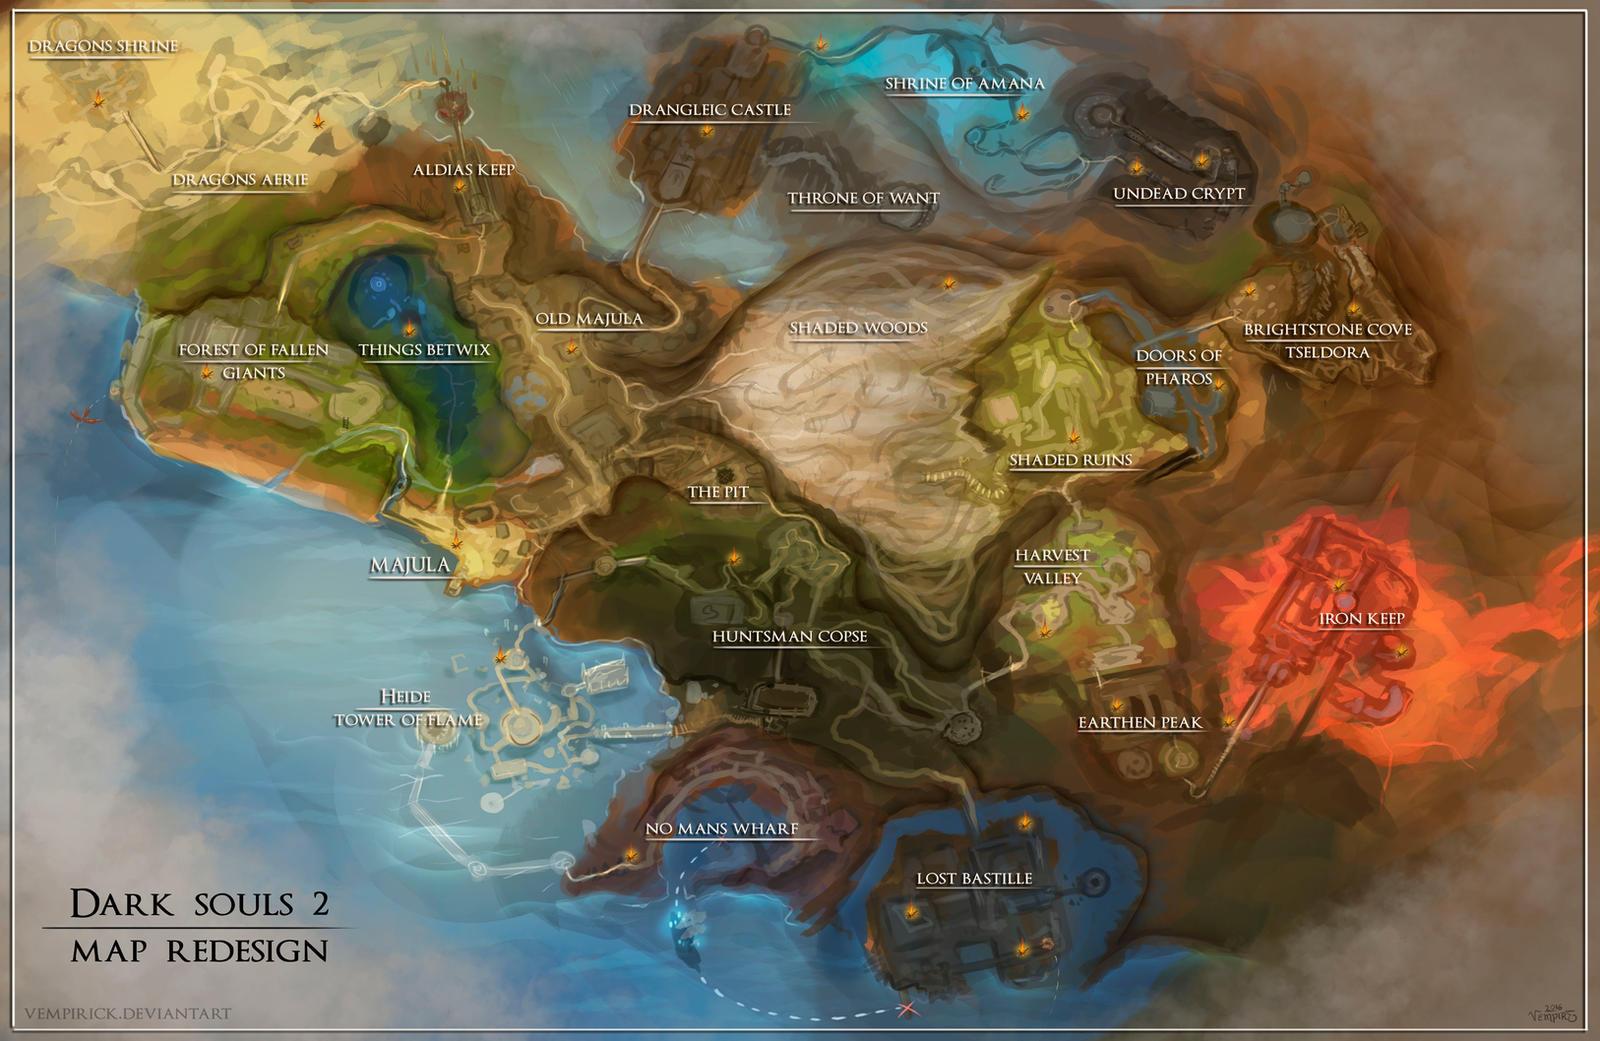 Dark Souls 2 Map Redesign By Vempirick On DeviantArt